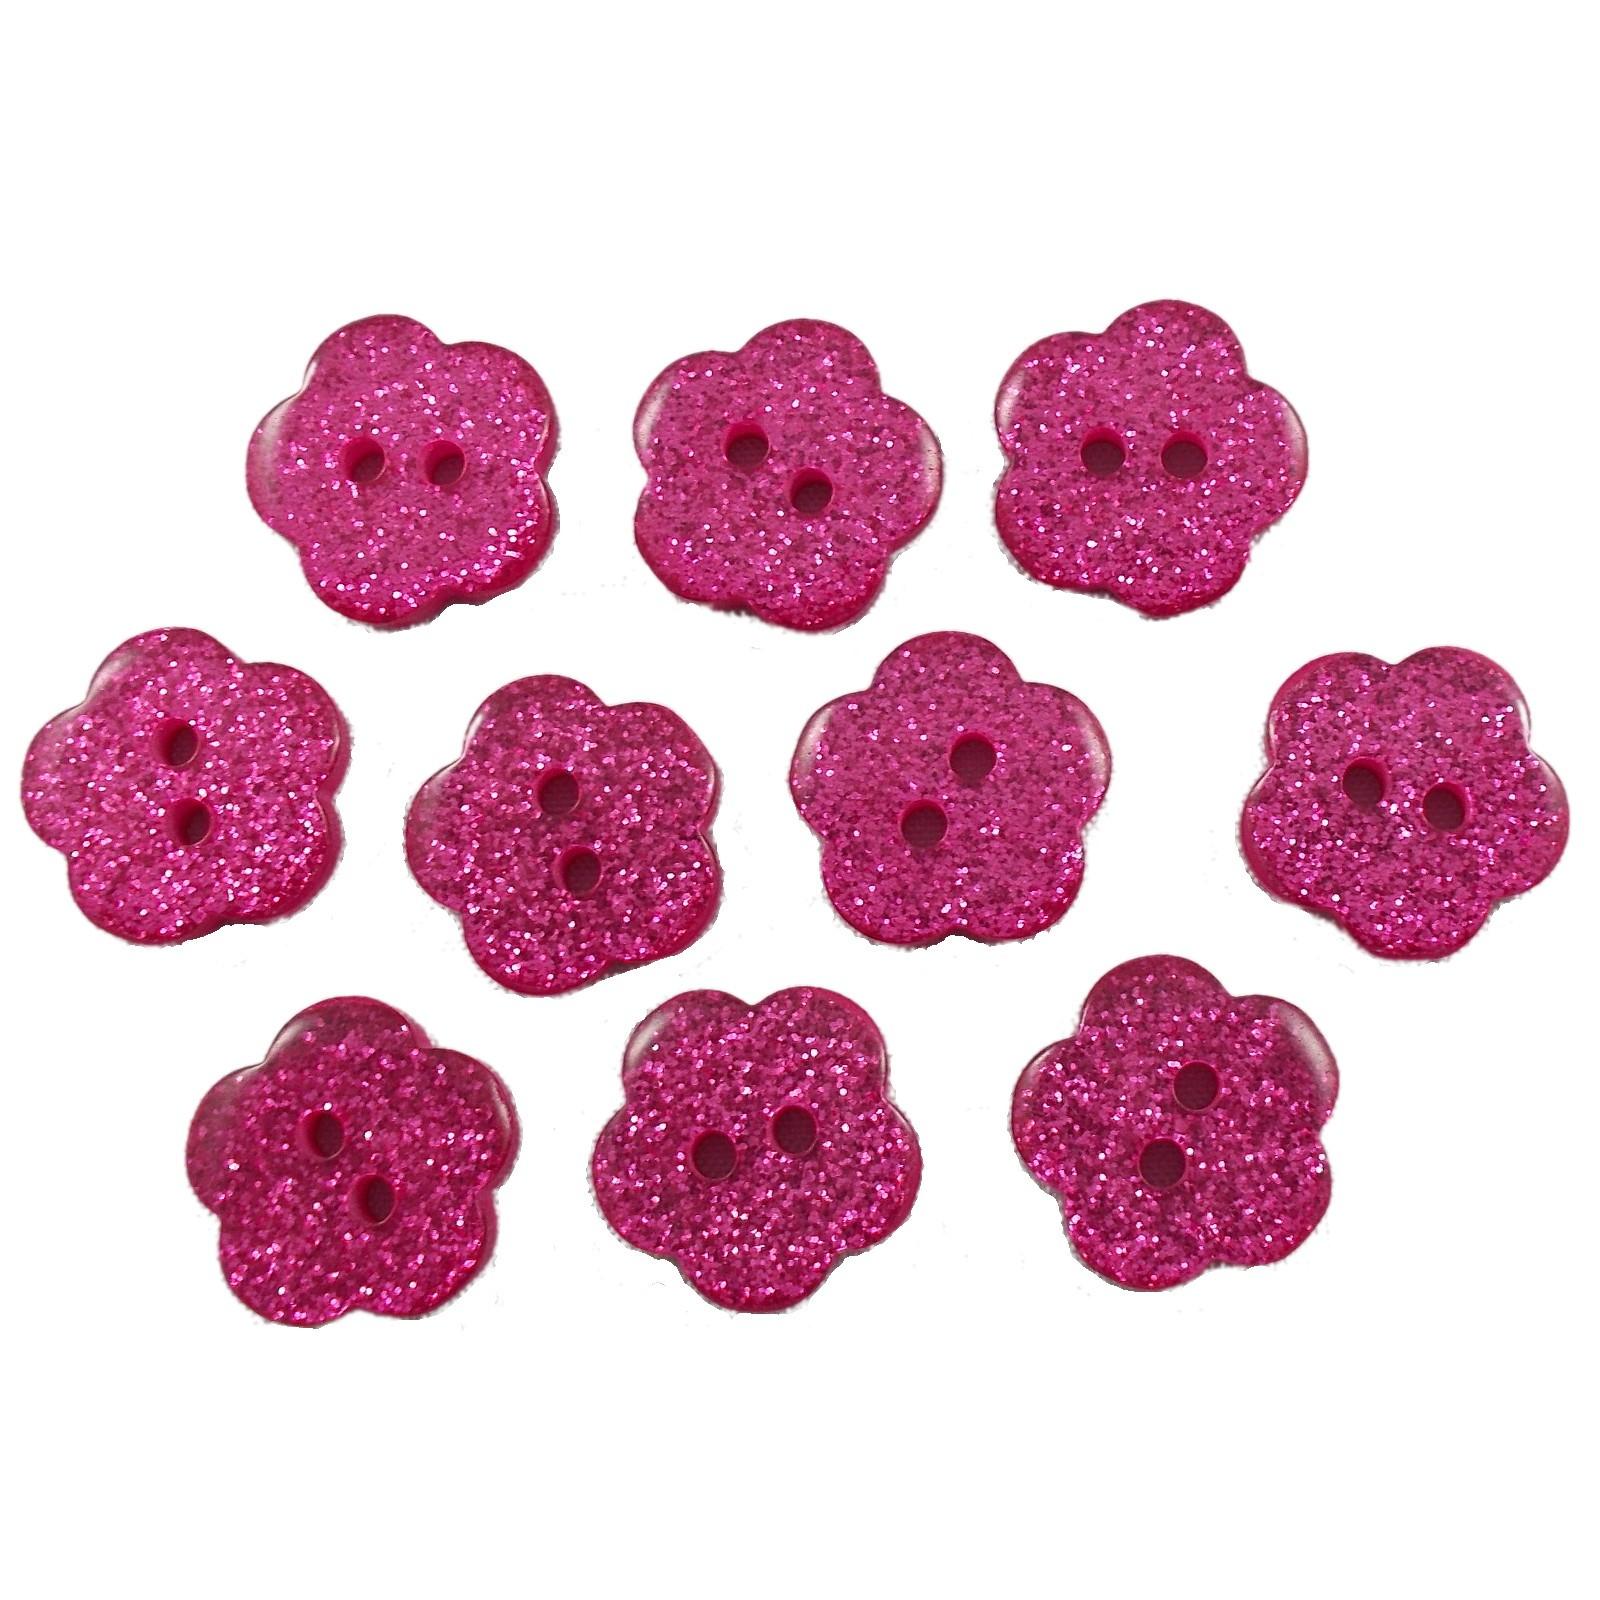 Colour Glitter Flower Shape Buttons 10mm Pink Pack of 10